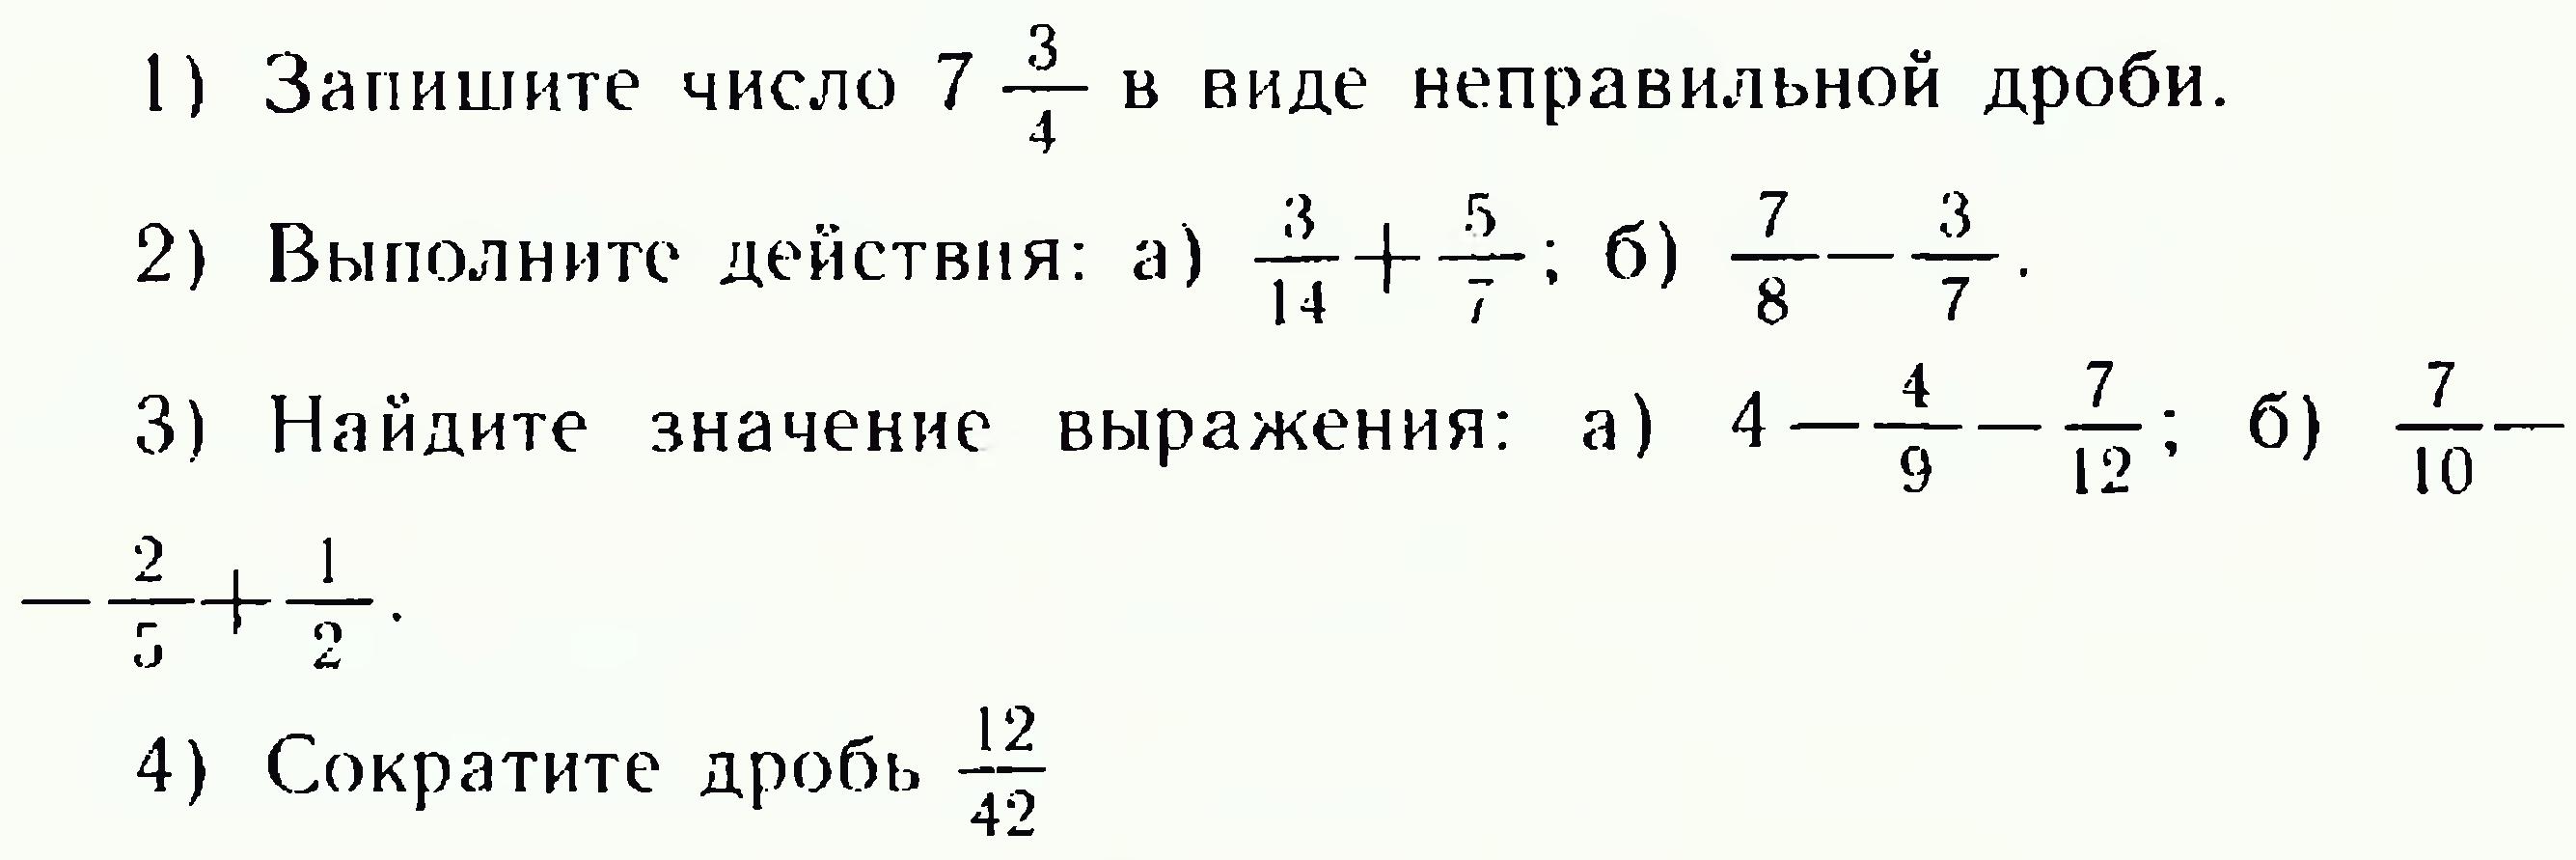 hello_html_m4c1b4bc4.png